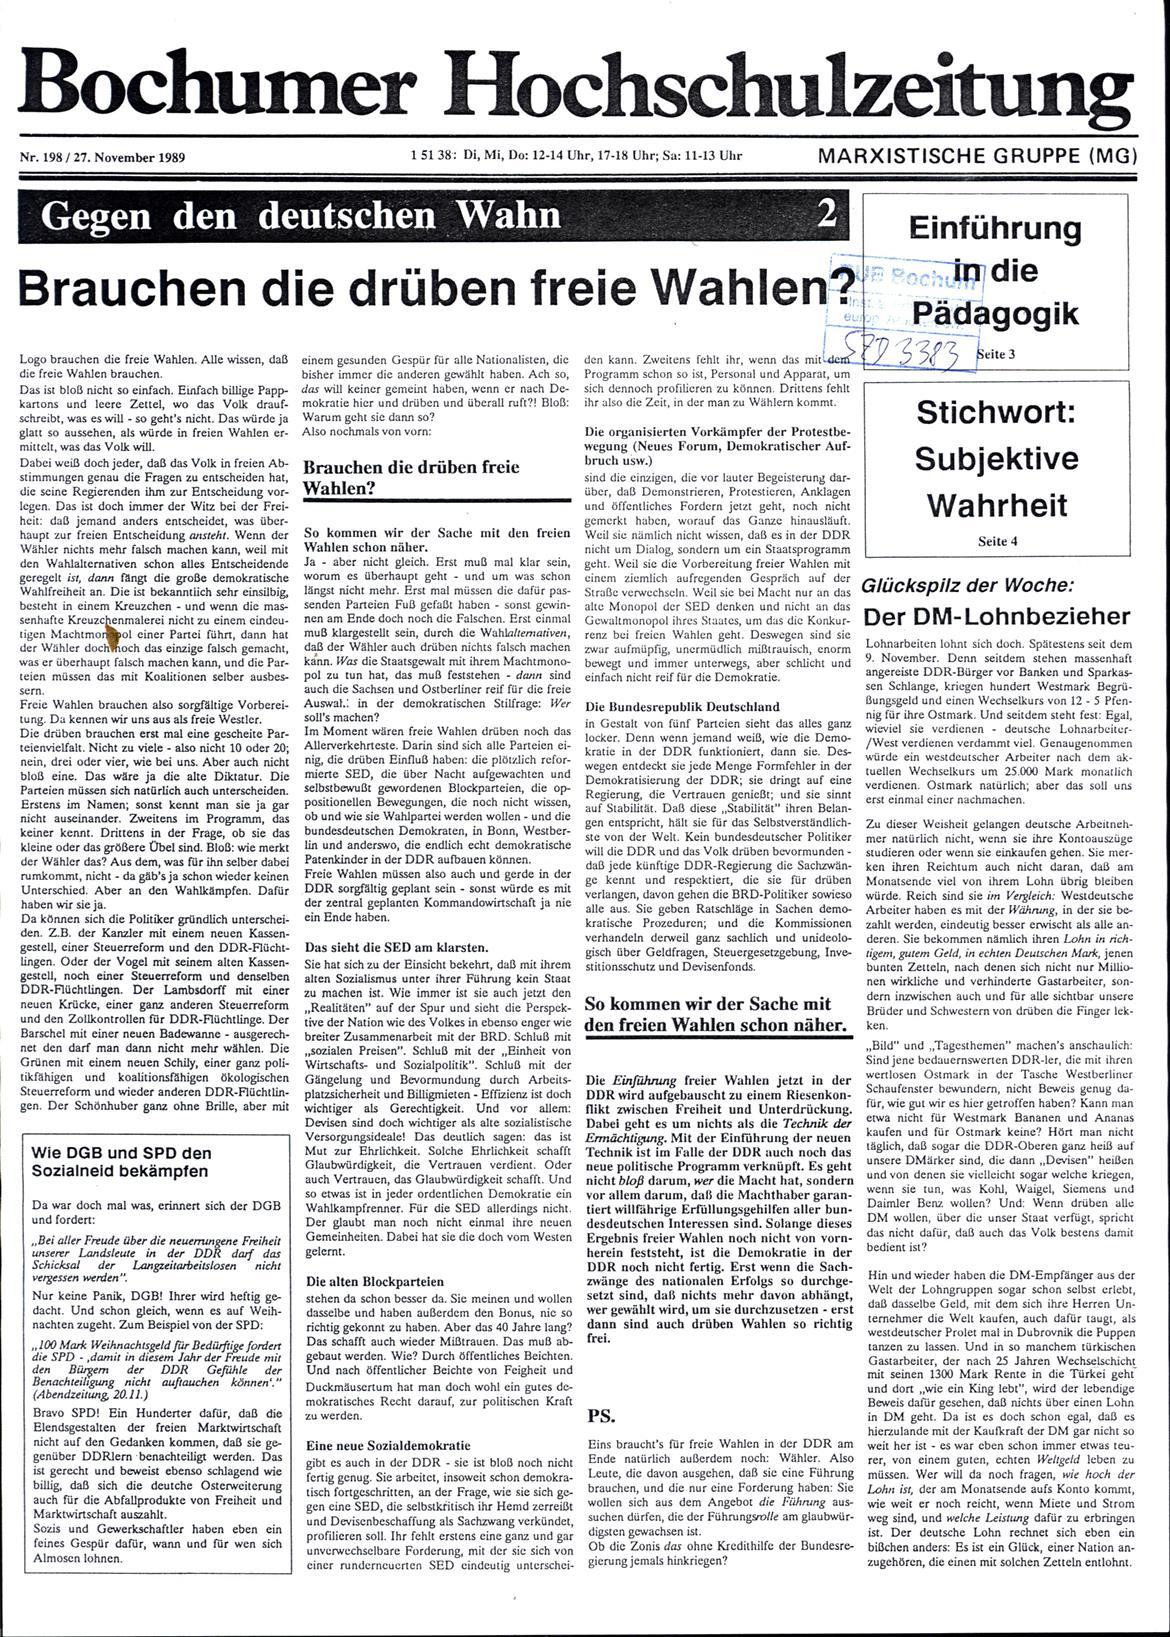 Bochum_BHZ_19891127_198_001